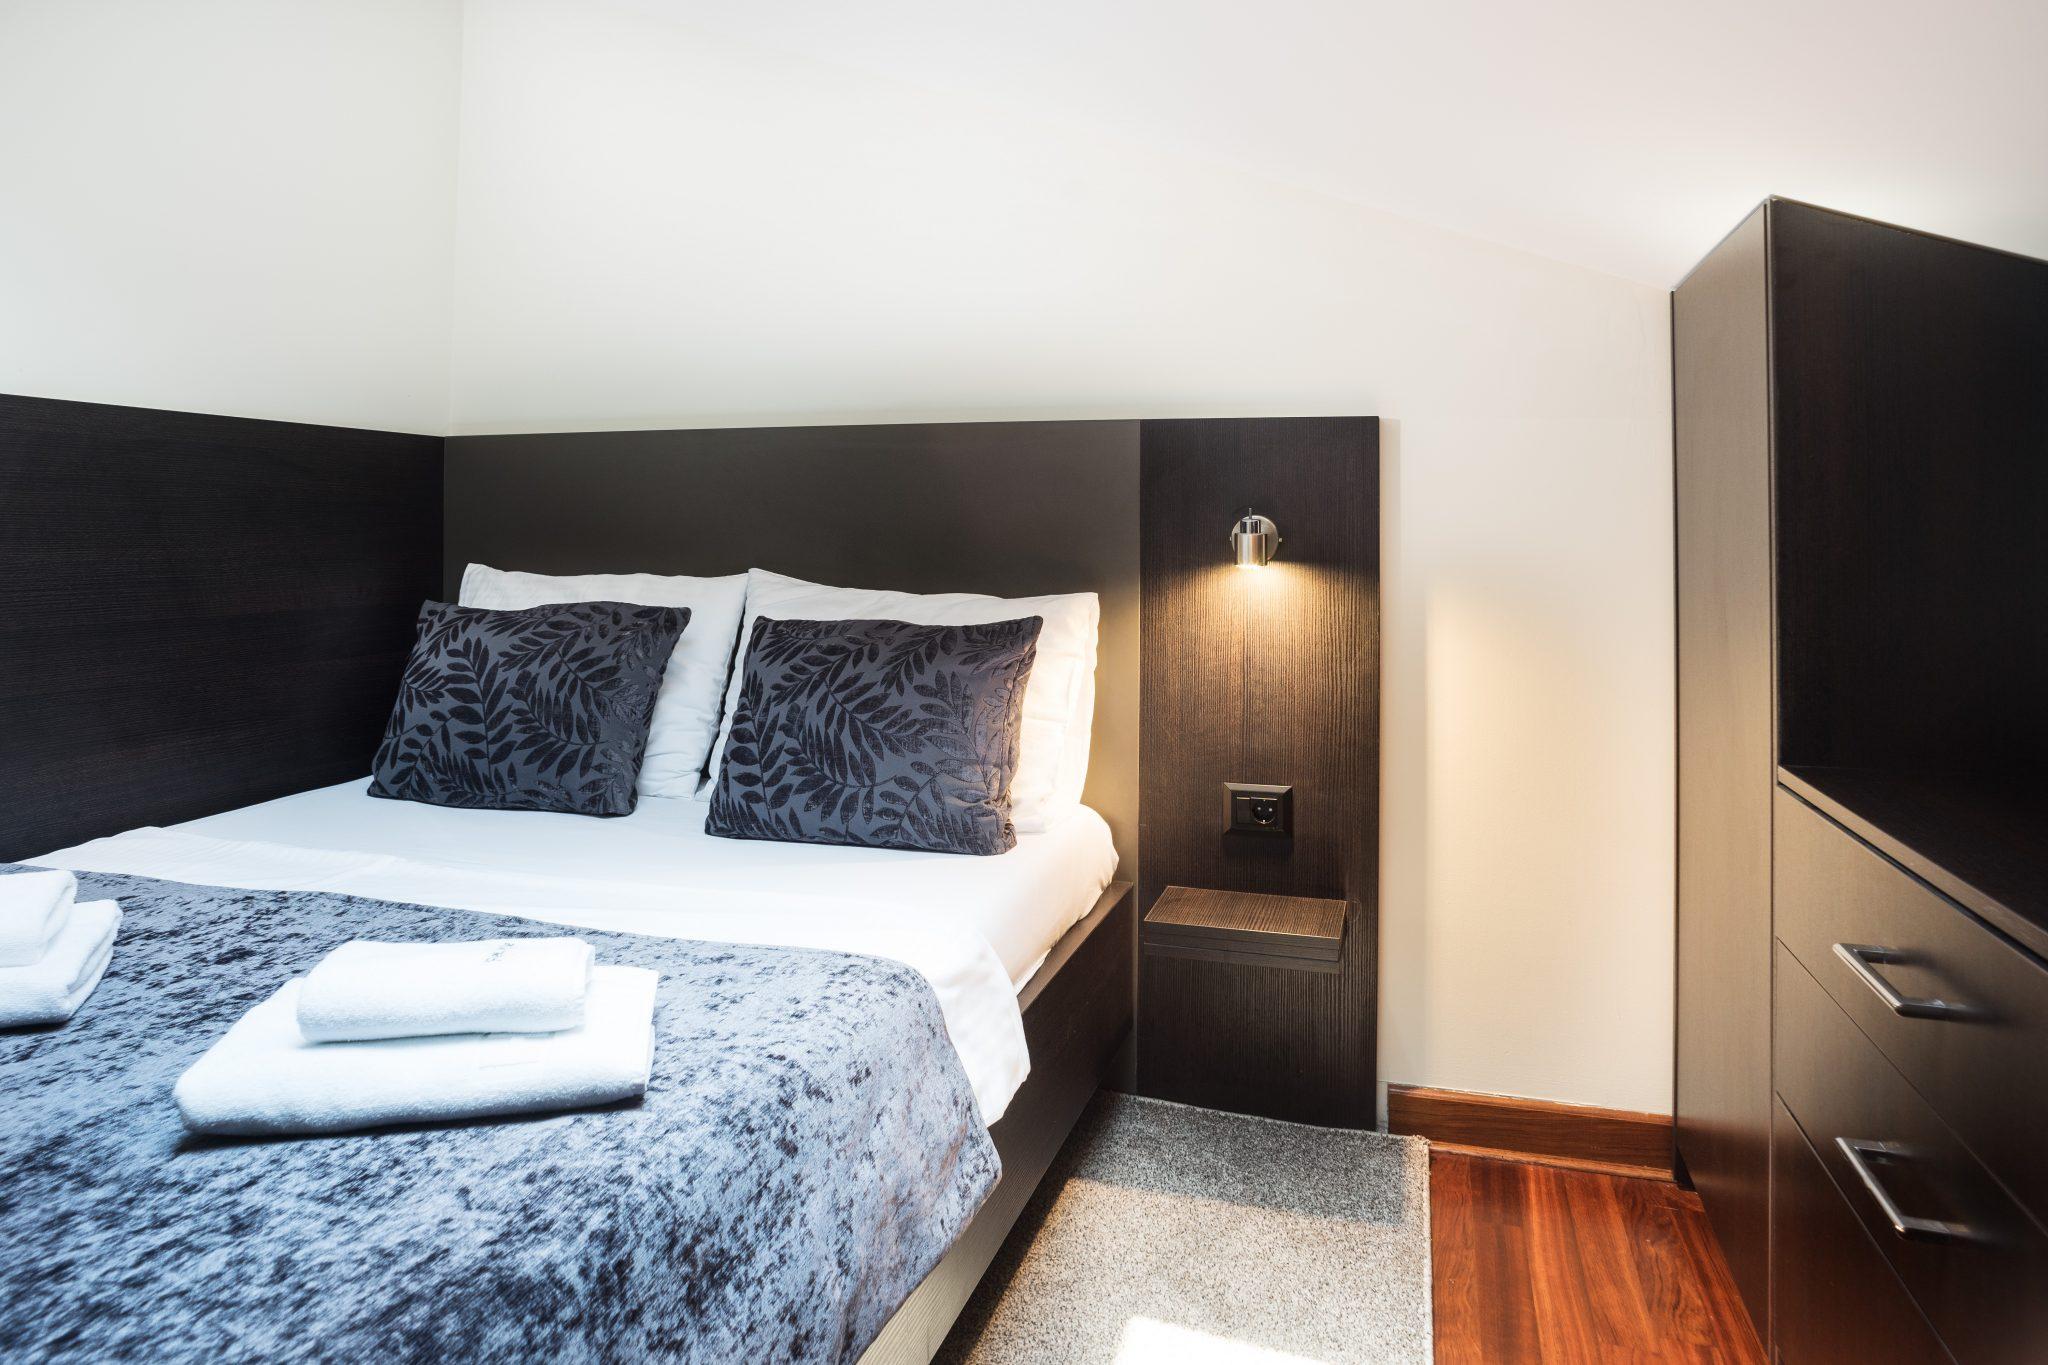 apartmani-u-beogradu-krevet